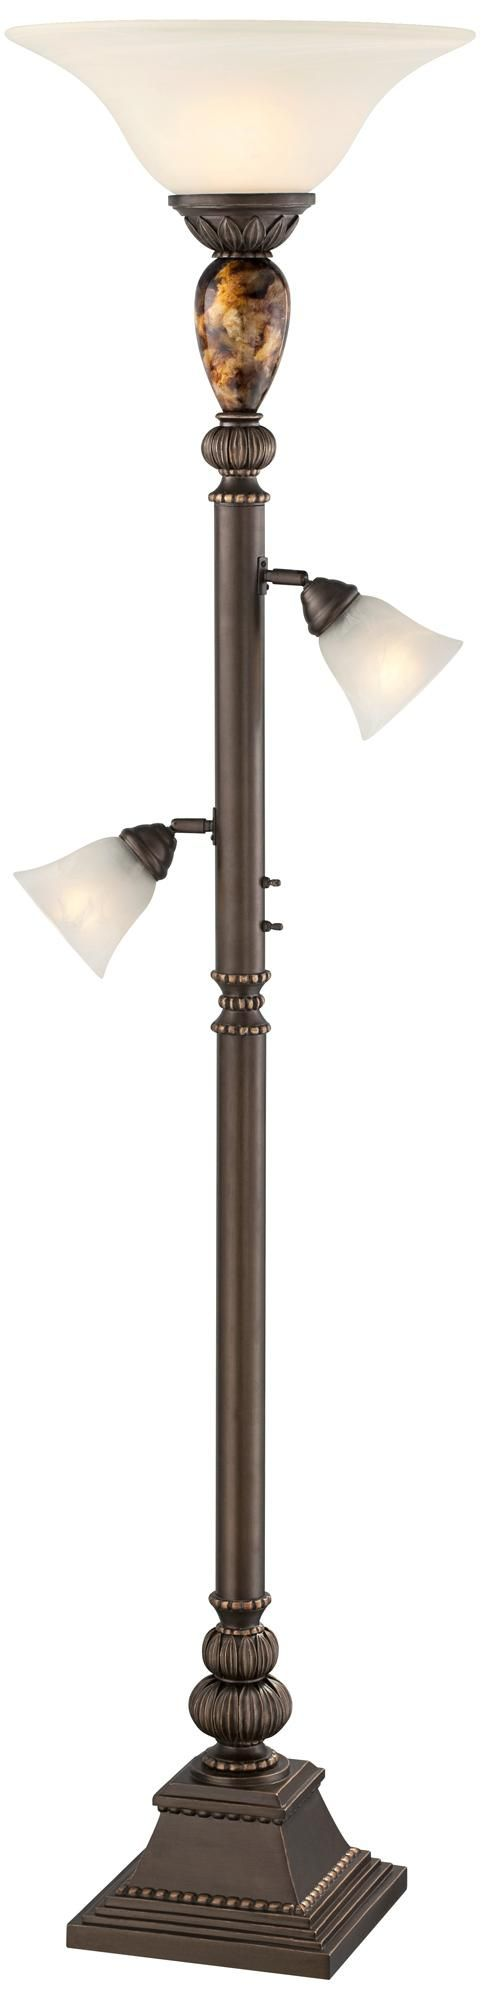 Mermaid floor lamp - Kathy Ireland Mulholland Tree Torchiere Floor Lamp